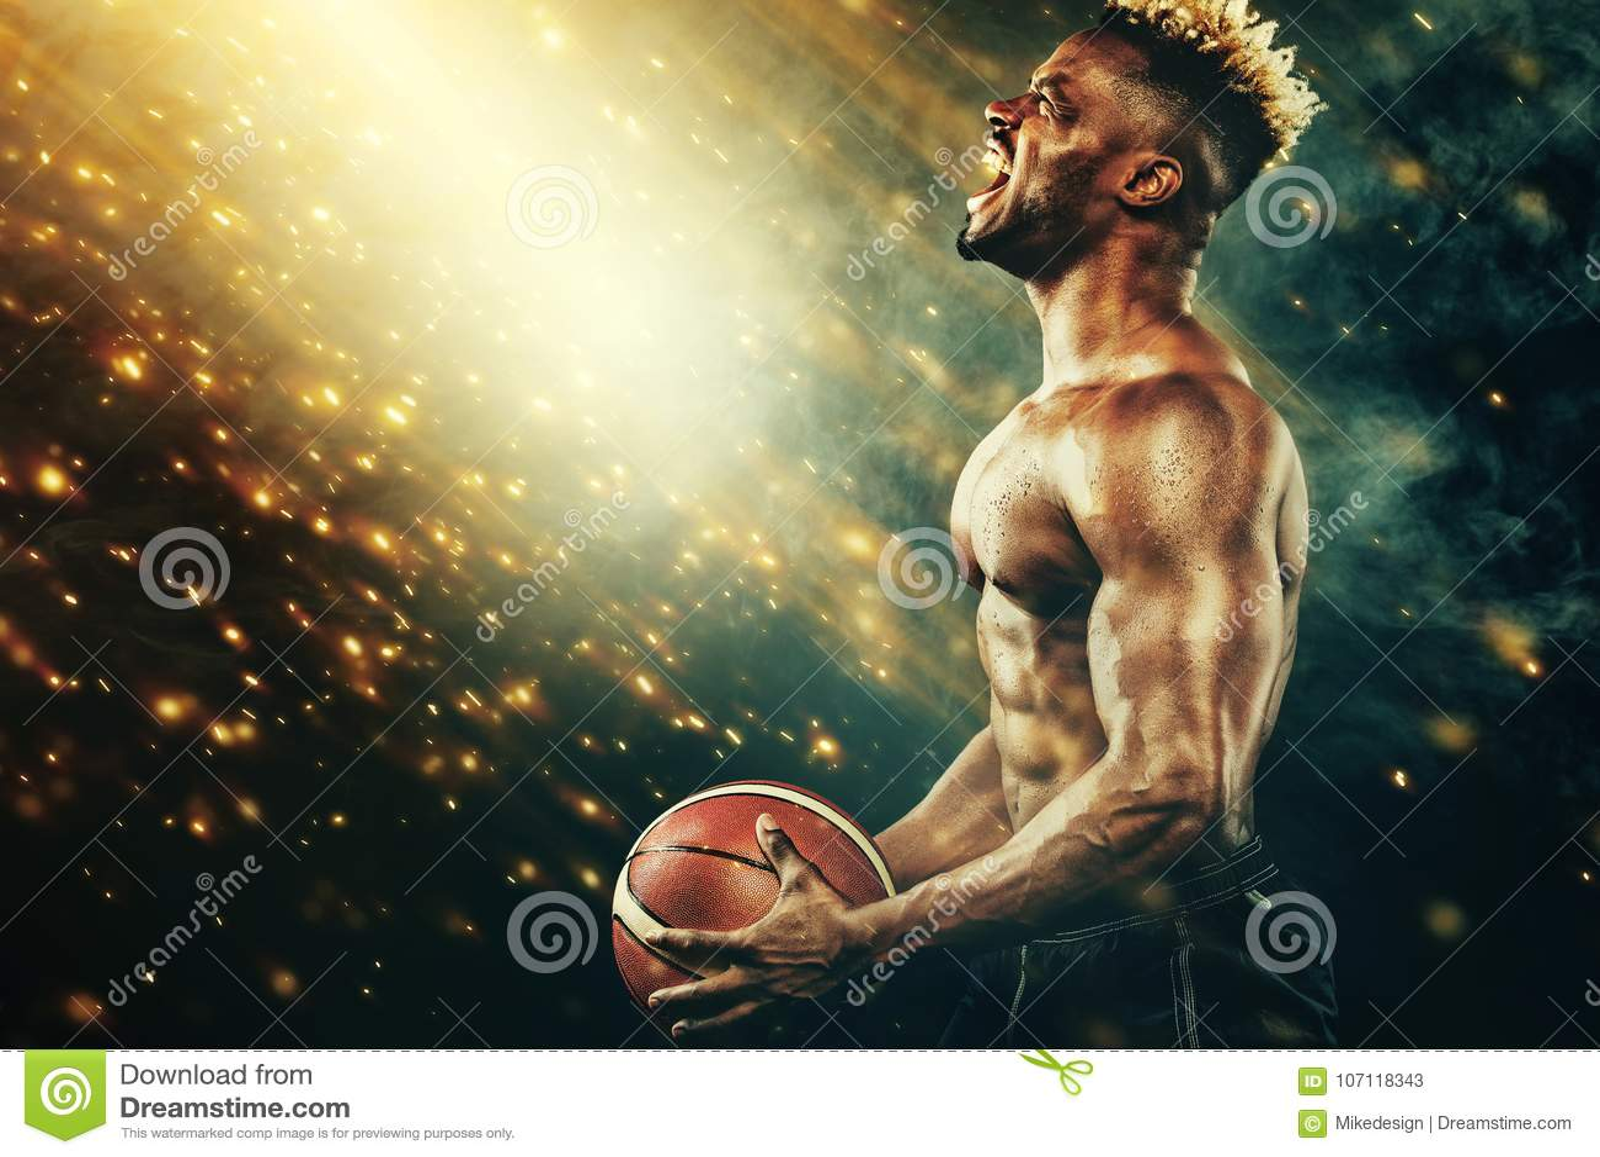 basketball wallpaper portrait of afro american sportsman